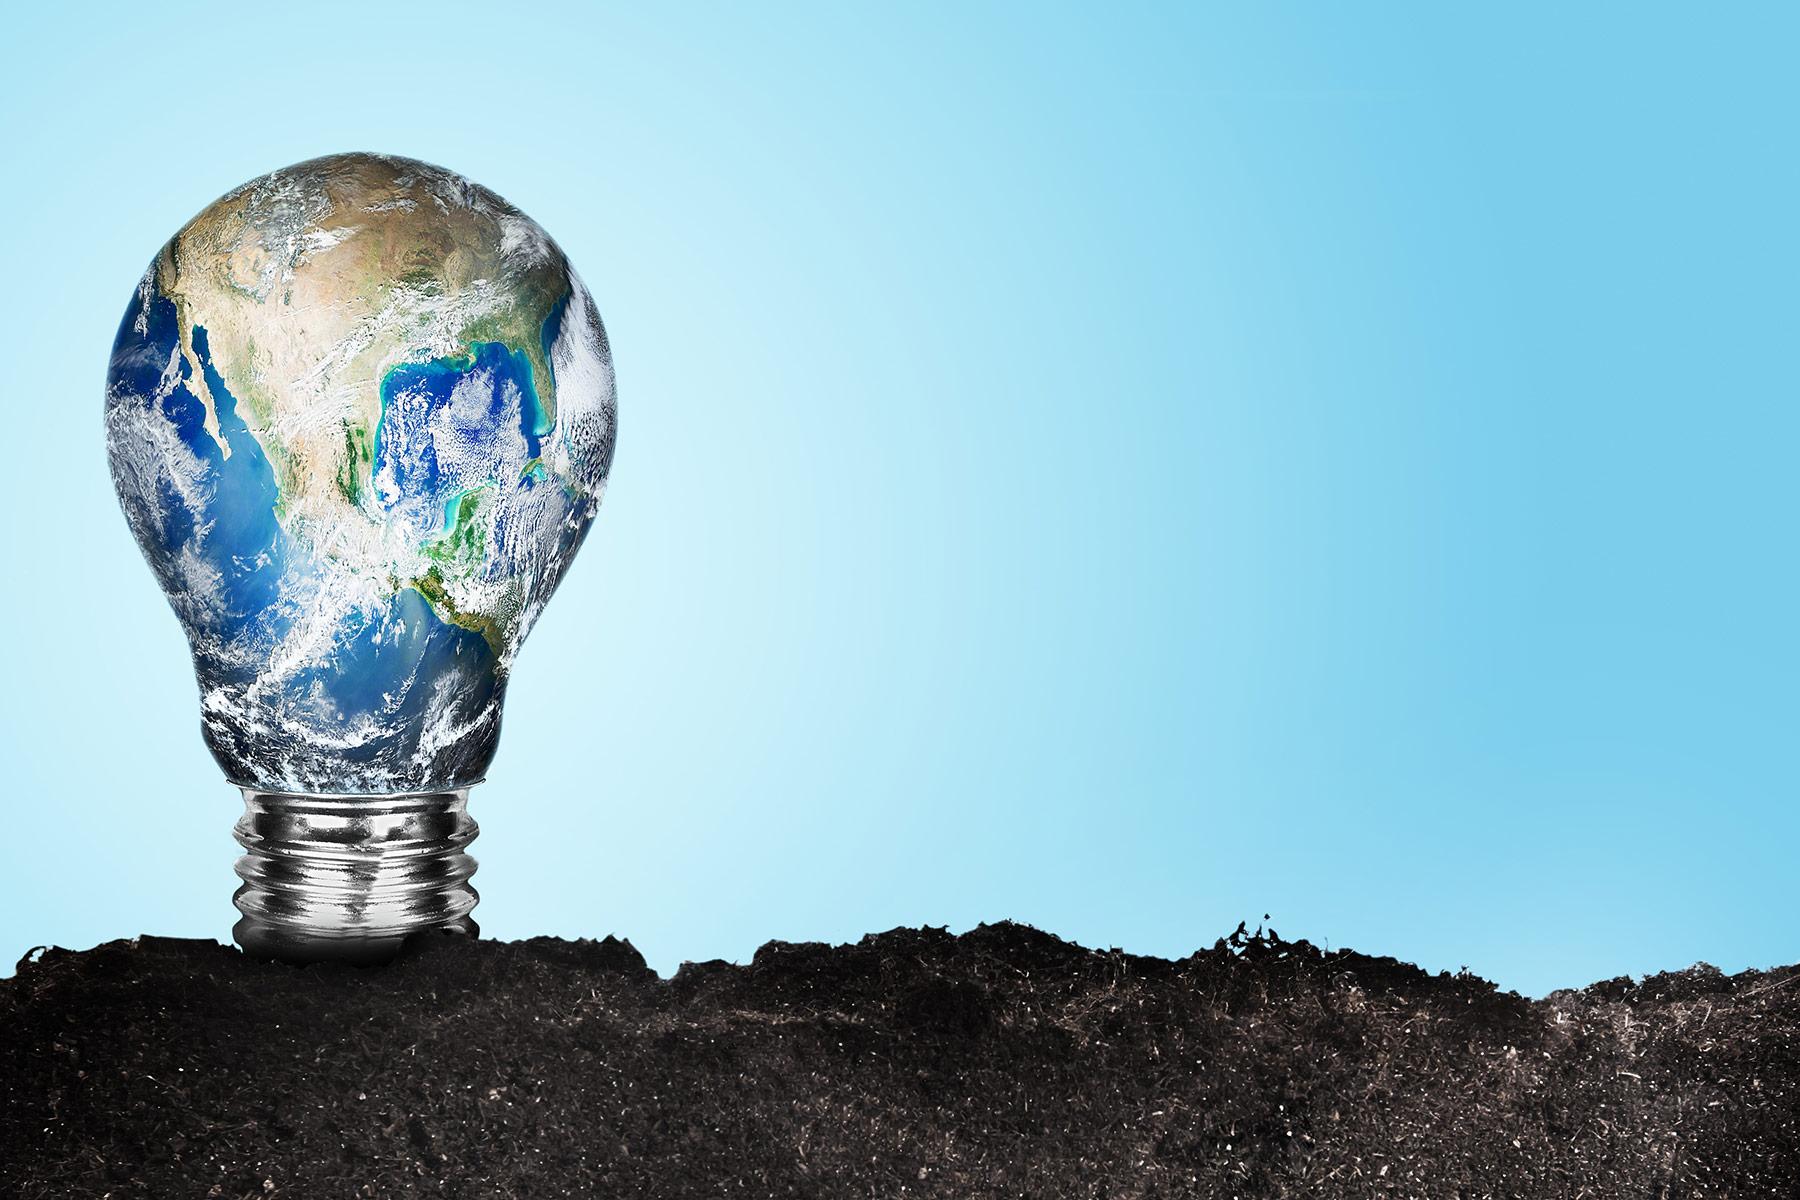 D veloppement durable alfortville - Plafond livret developpement durable societe generale ...